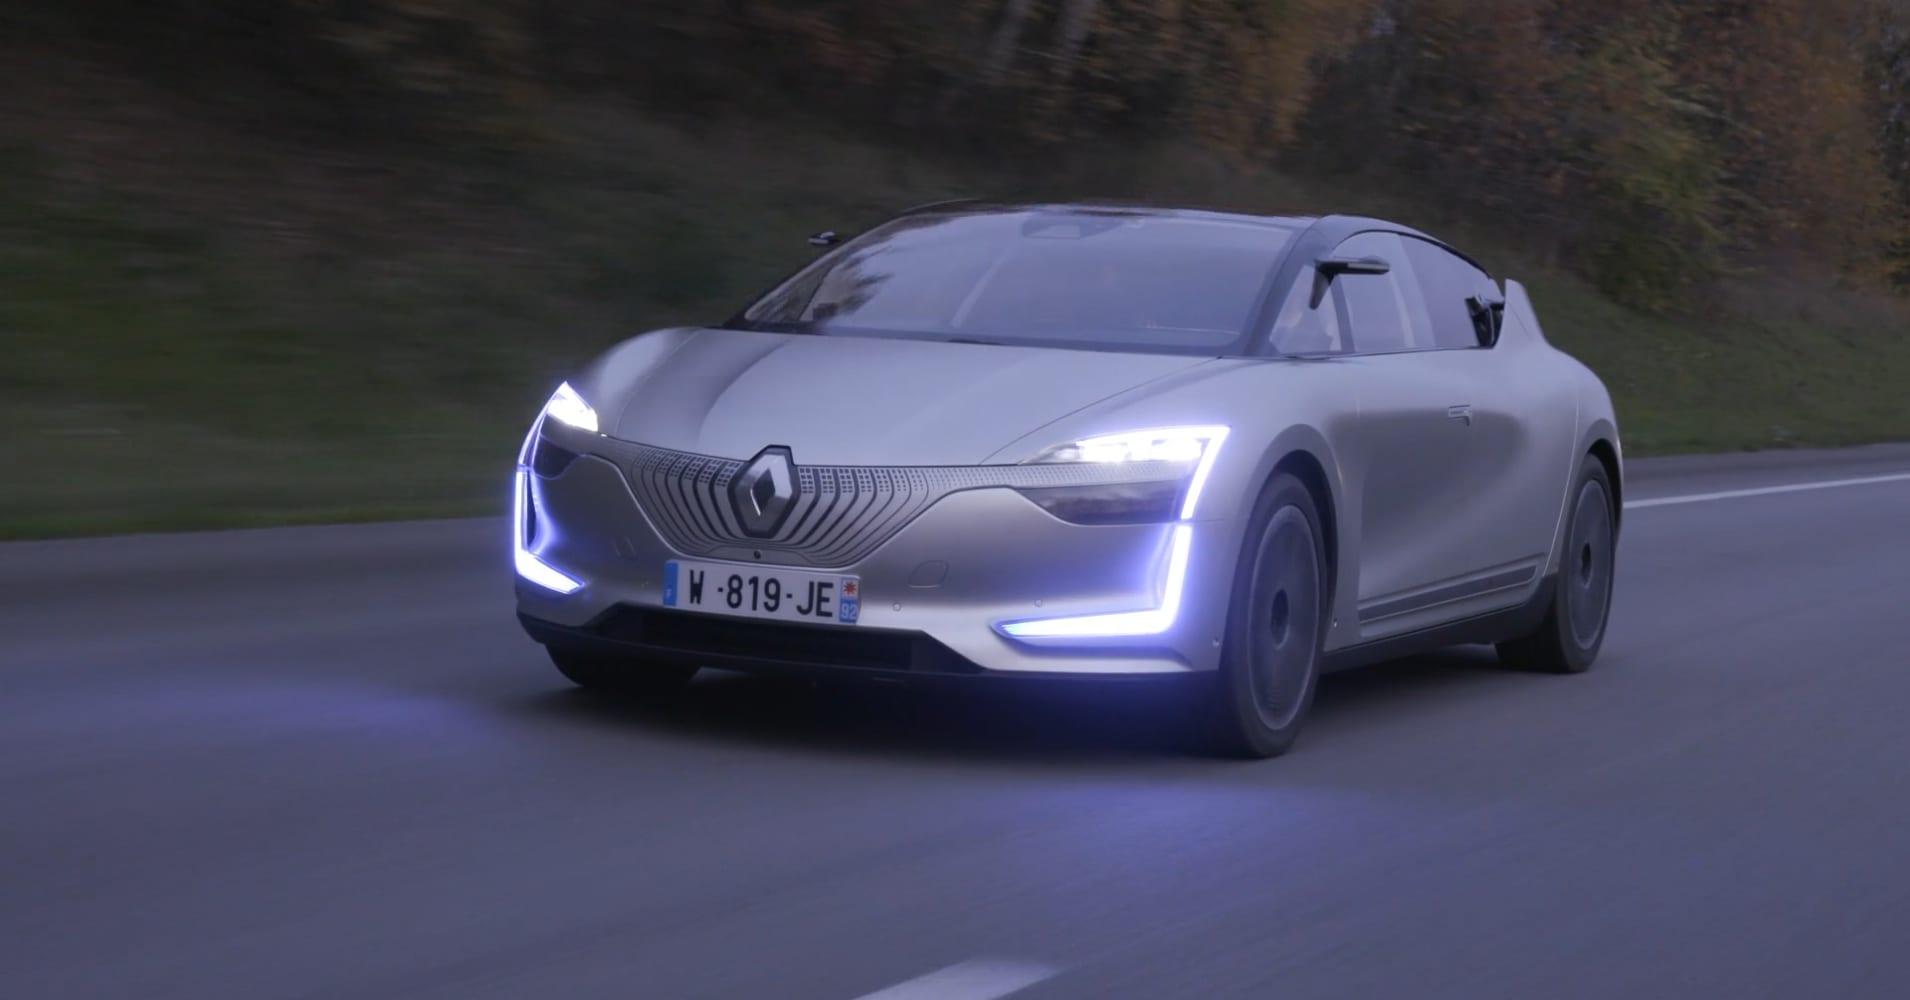 Renault S Symbioz Self Driving Demo Car